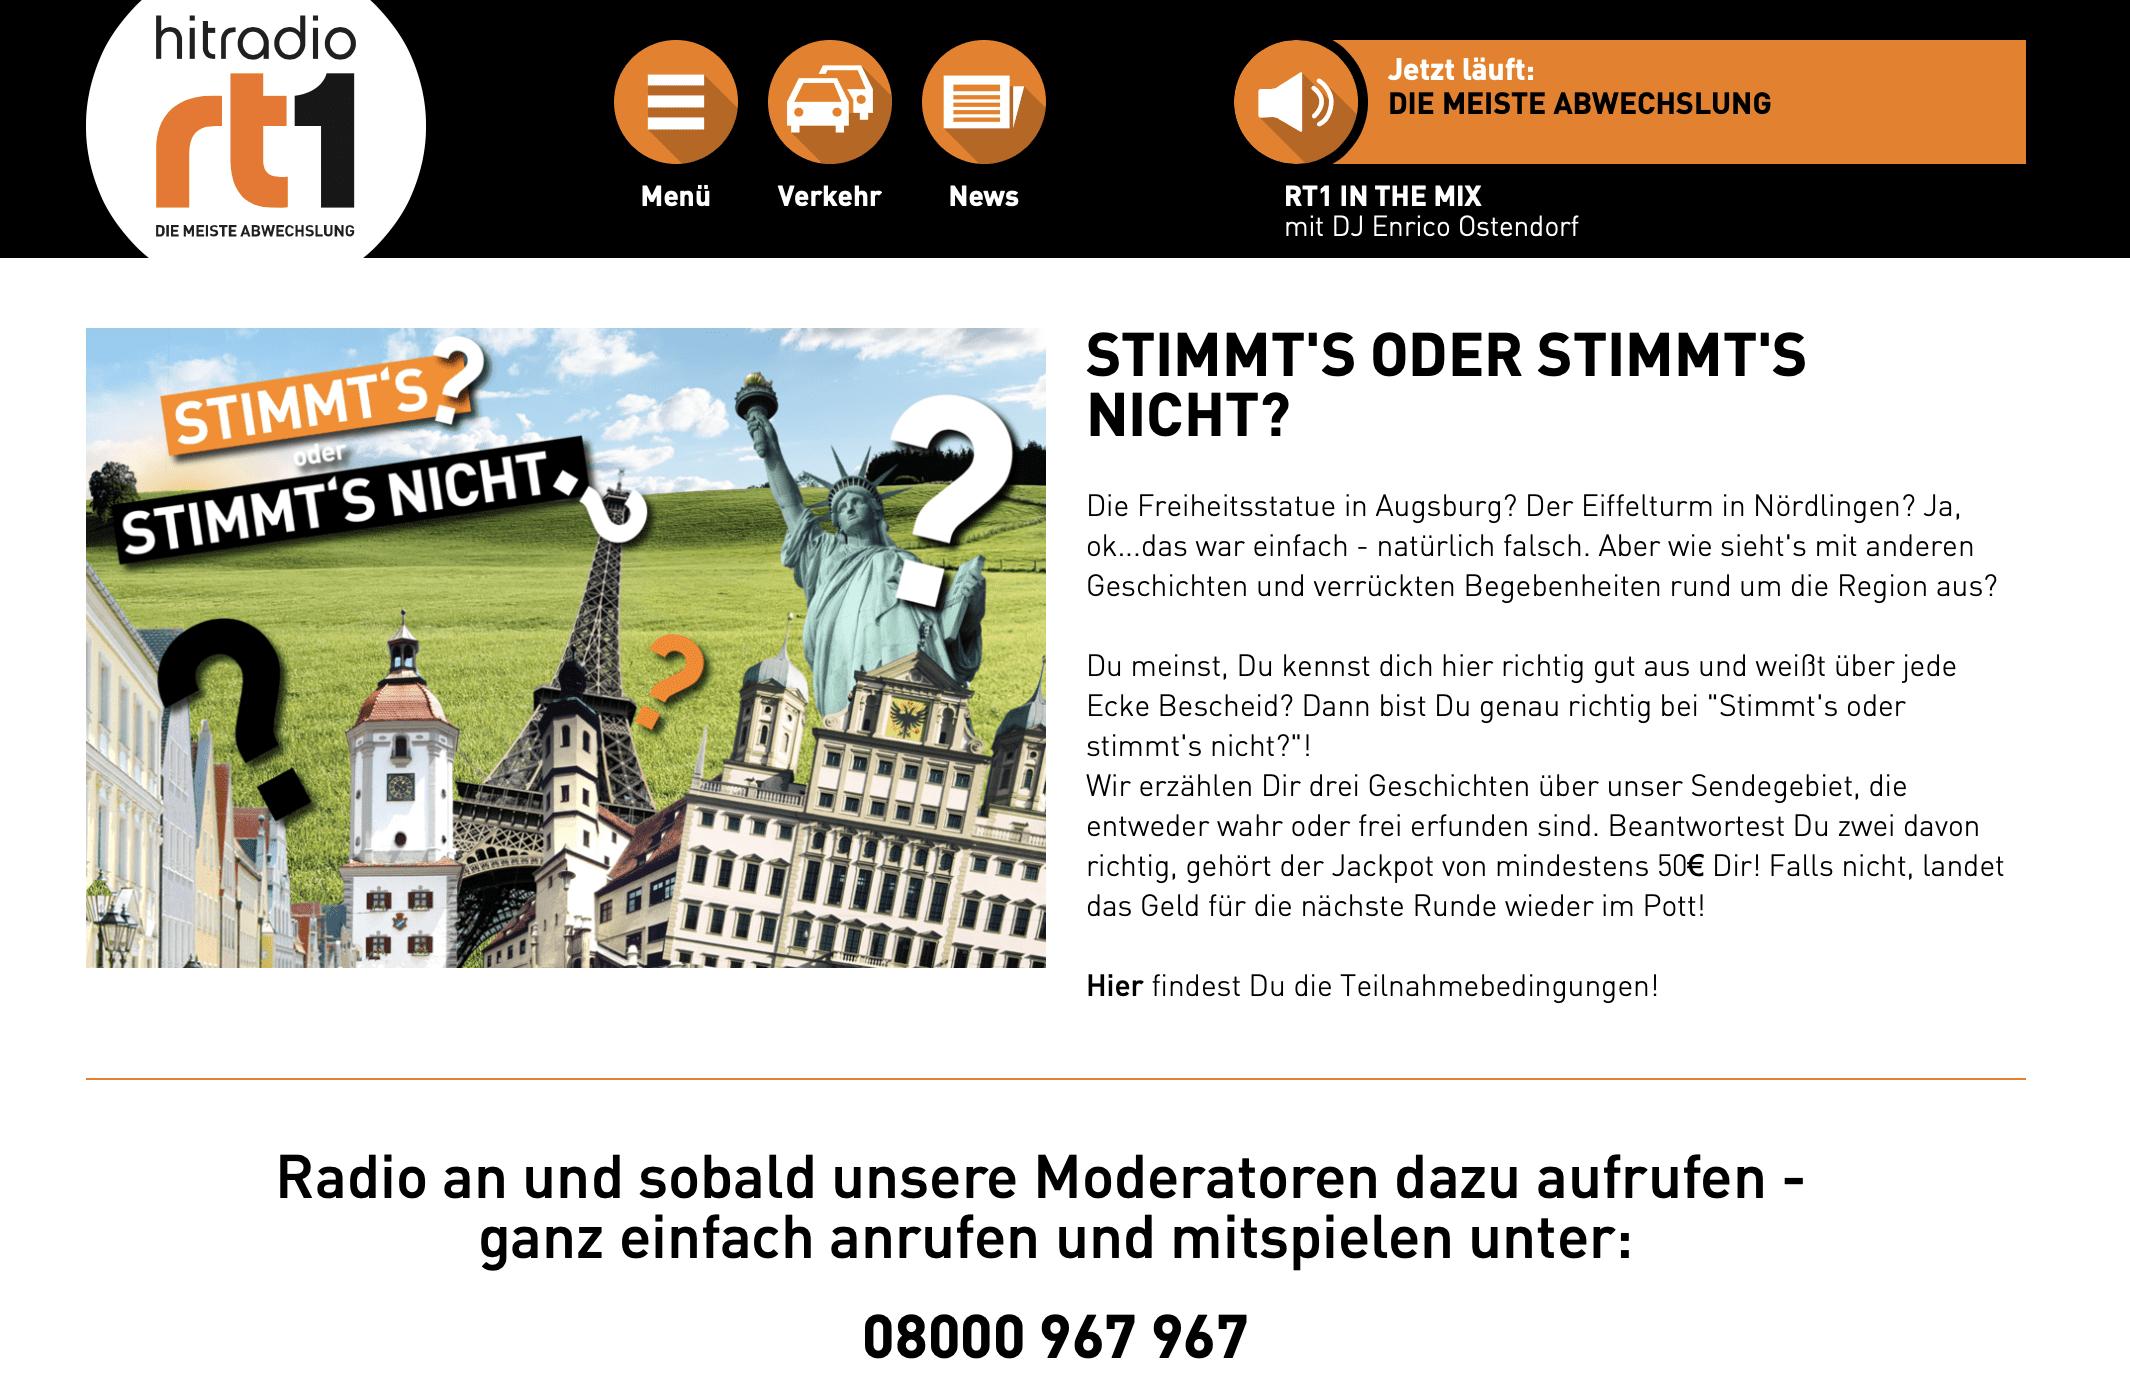 Gewinnspiel-Cases Radio & TV Hutradio rt1